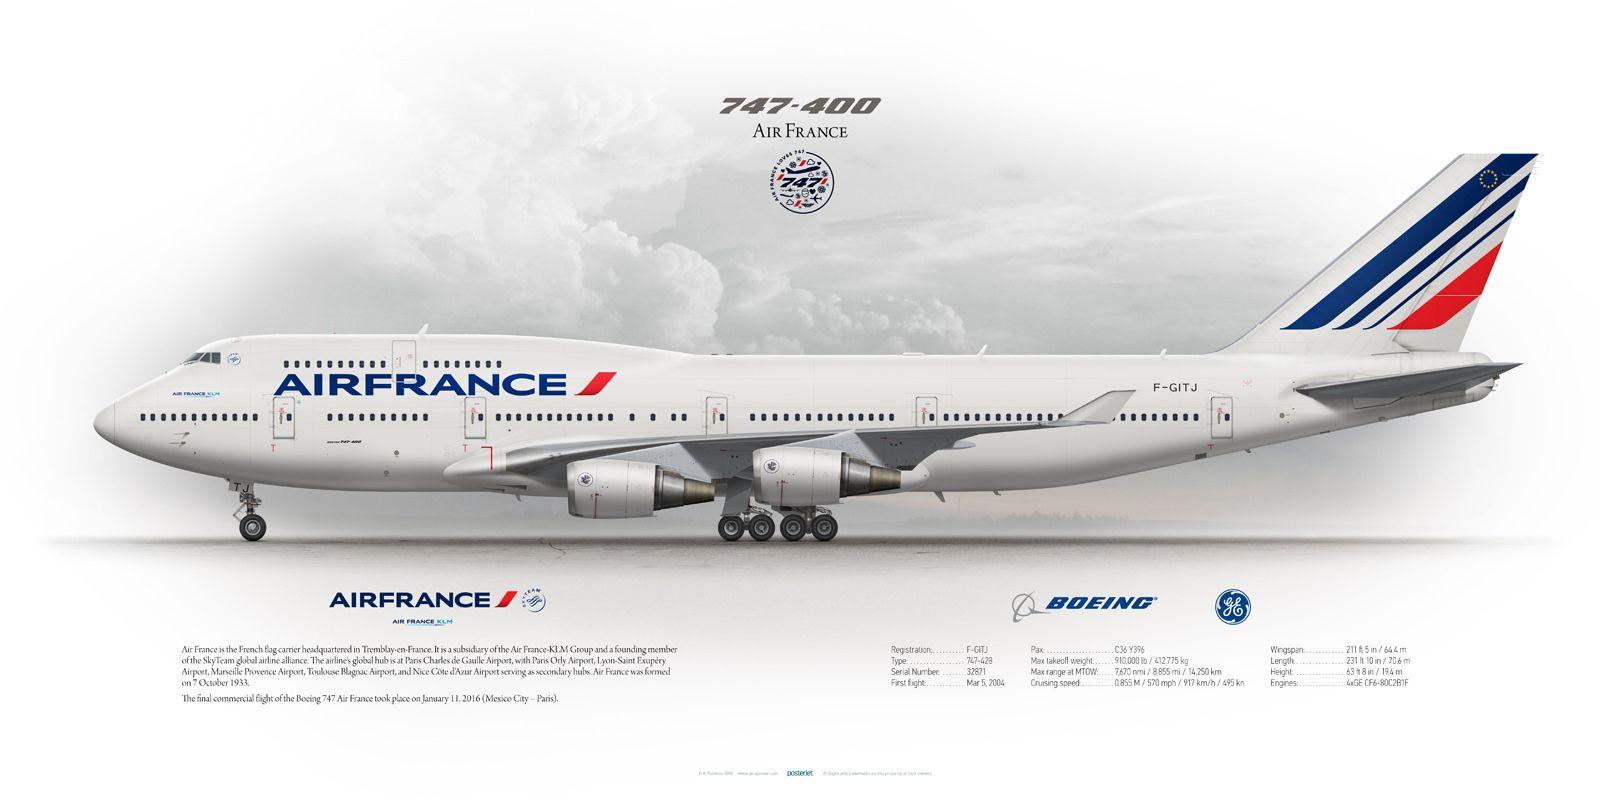 Boeing 747-400 Air France F-GITJ